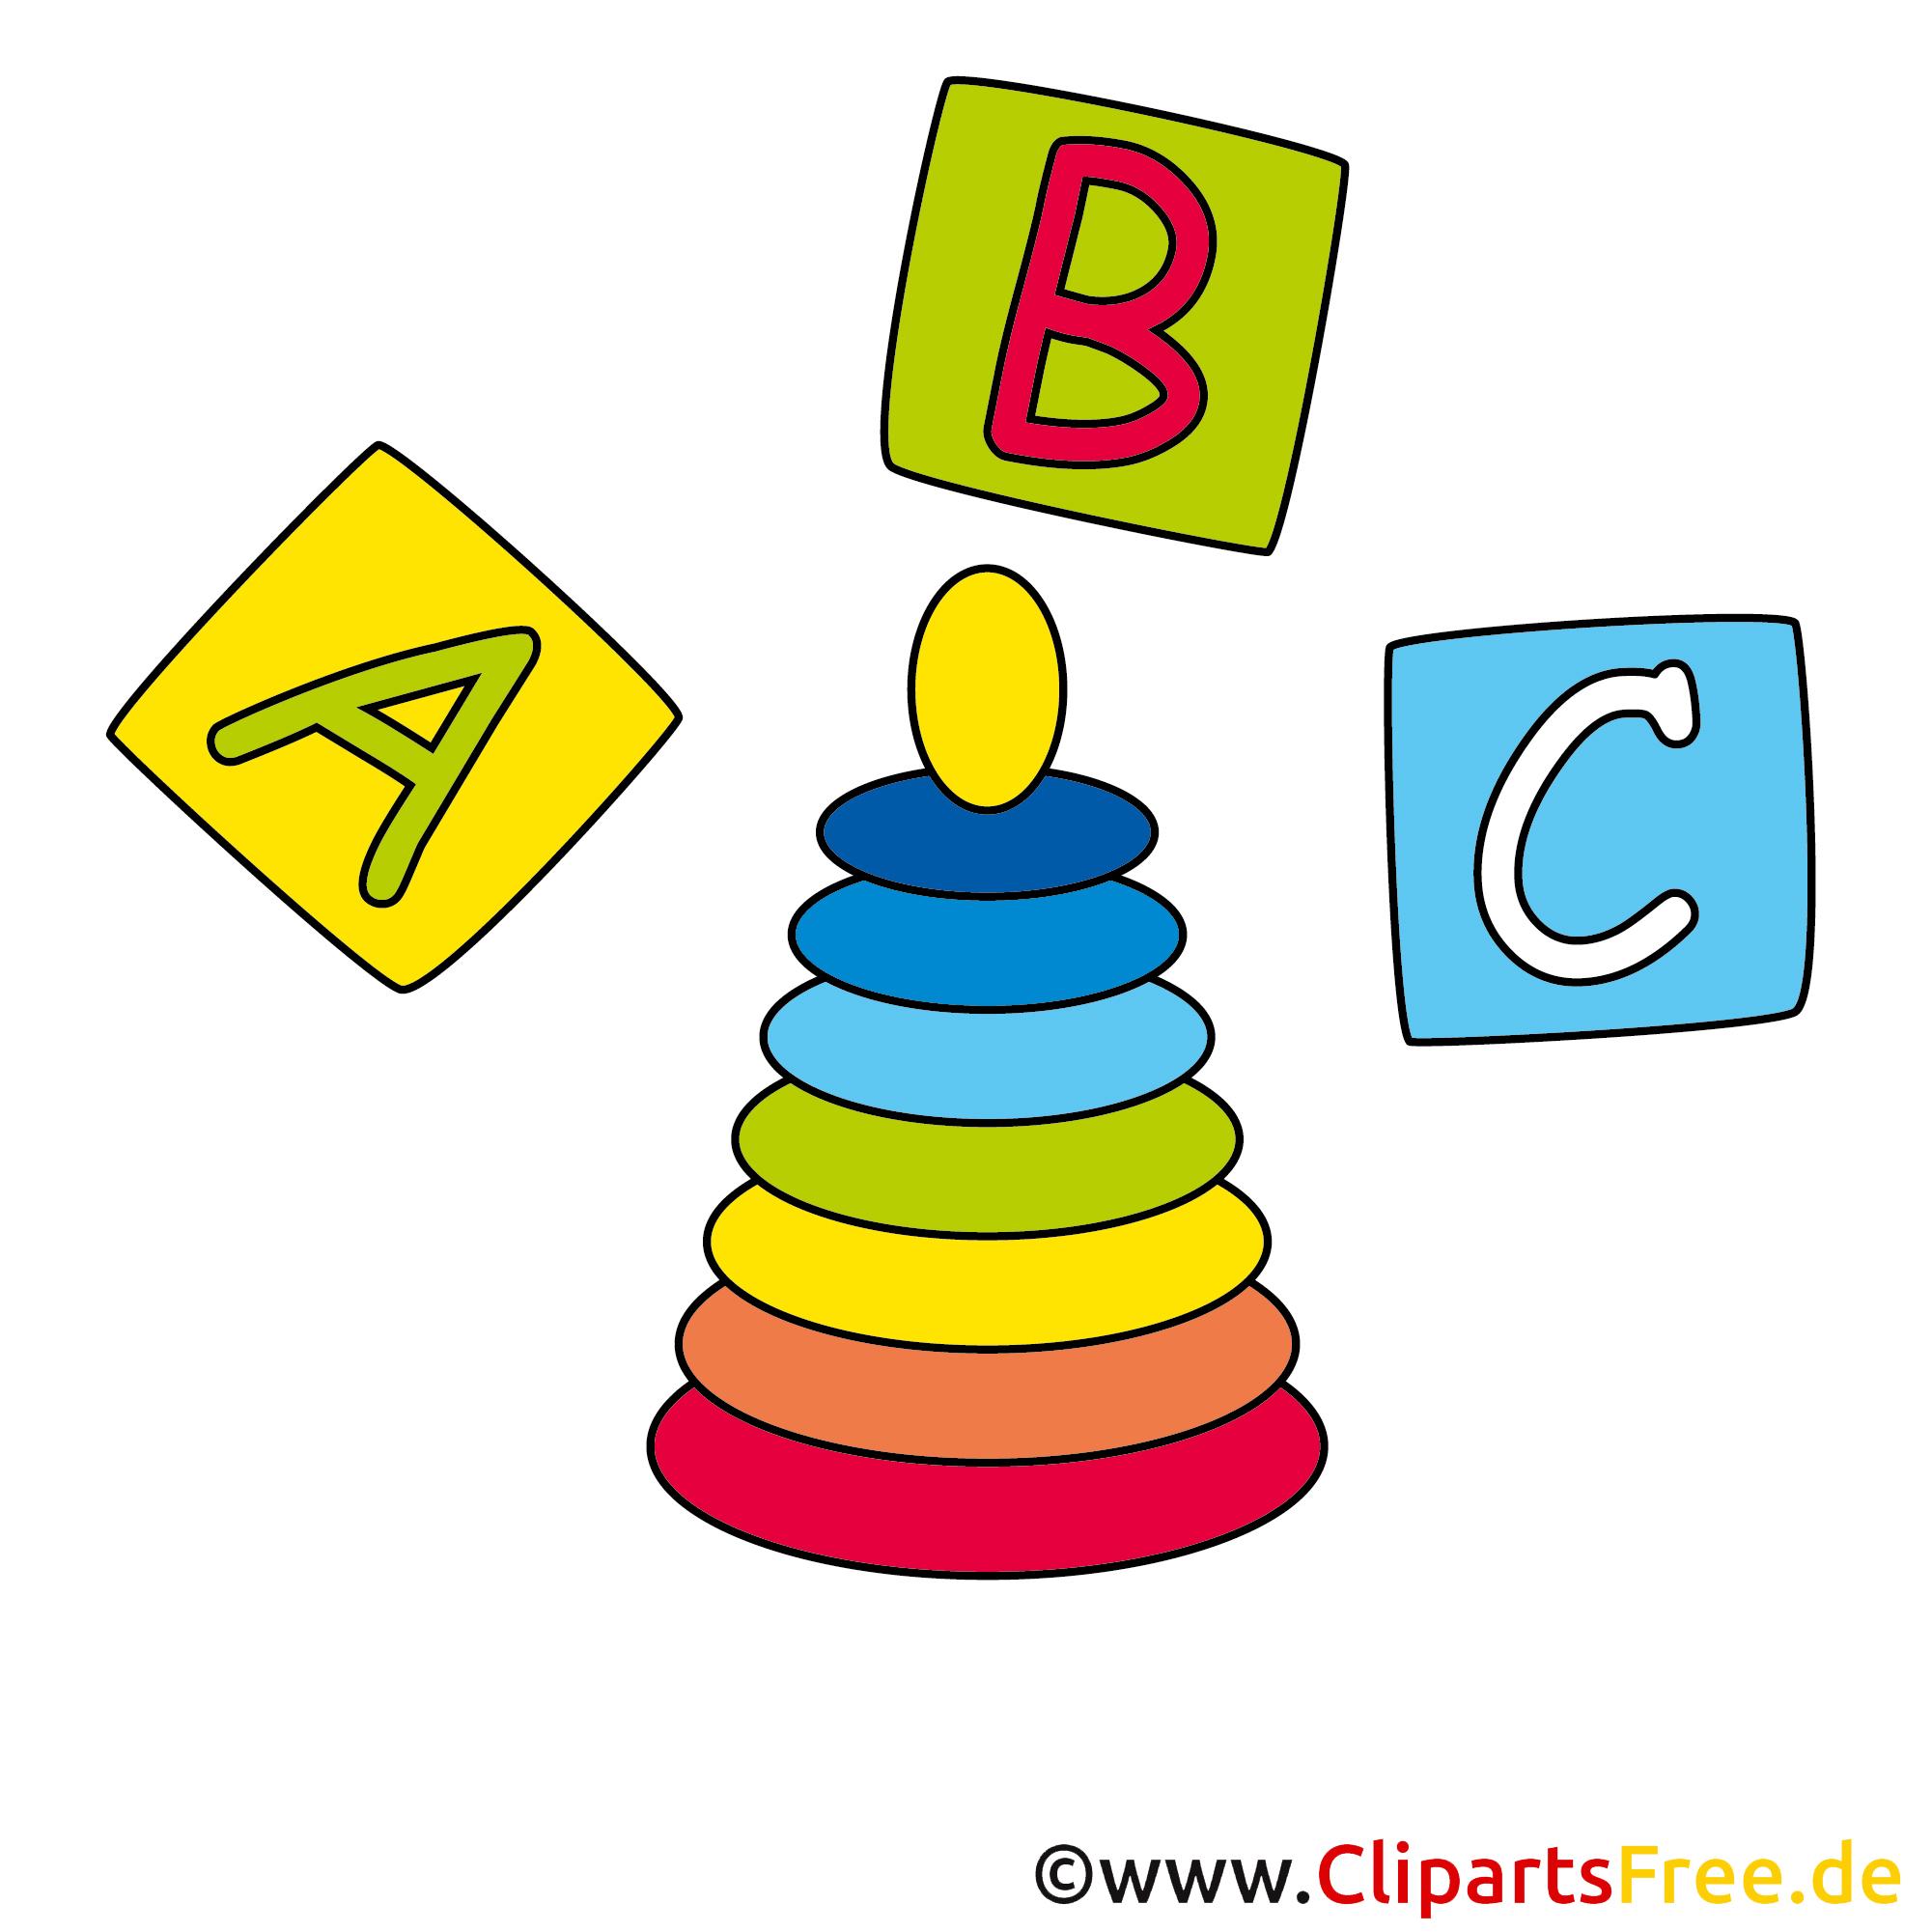 Baby Pyramide Spielzeug Bild